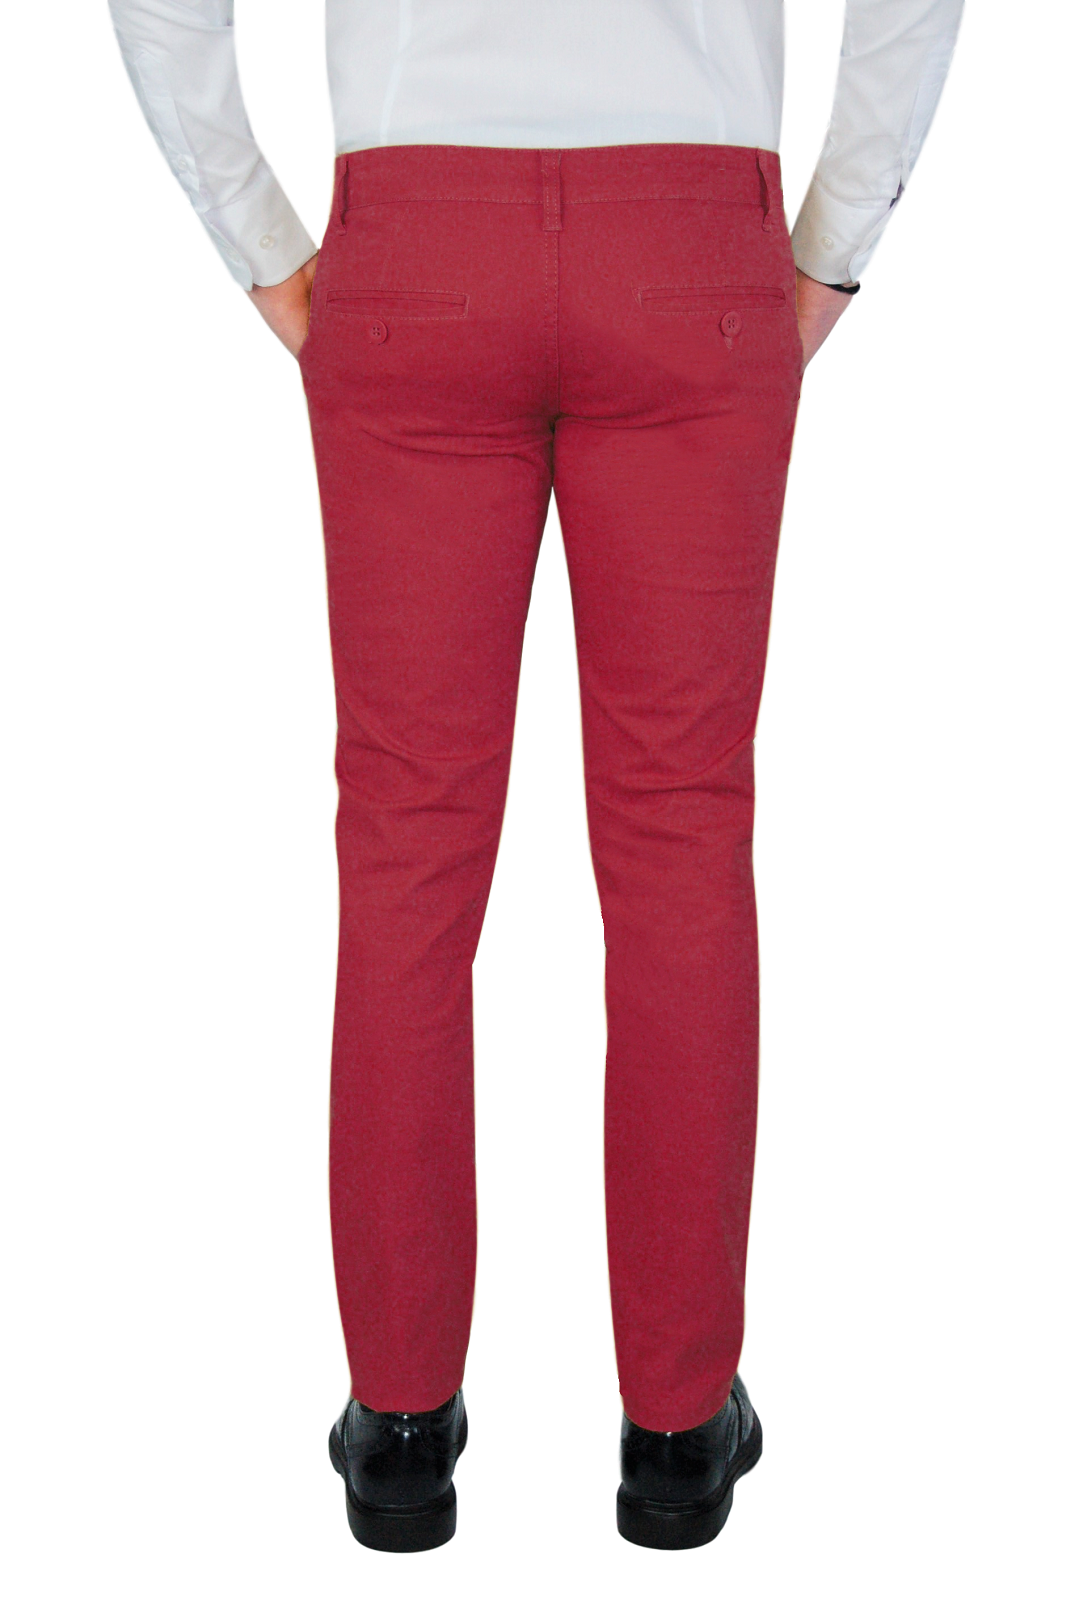 Pantalone-Uomo-Invernale-Slim-Fit-Chino-tasca-america-Cotone-Blu-Nero-Verde miniatura 25